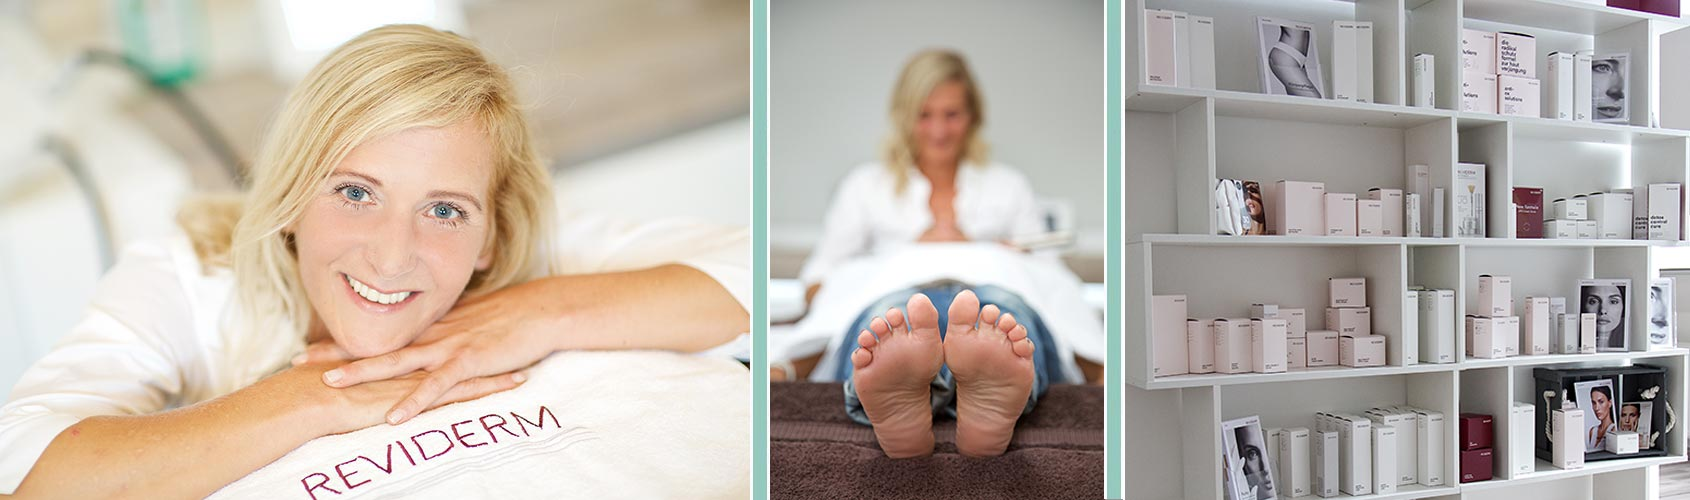 Kosmetik Reviderm Massage